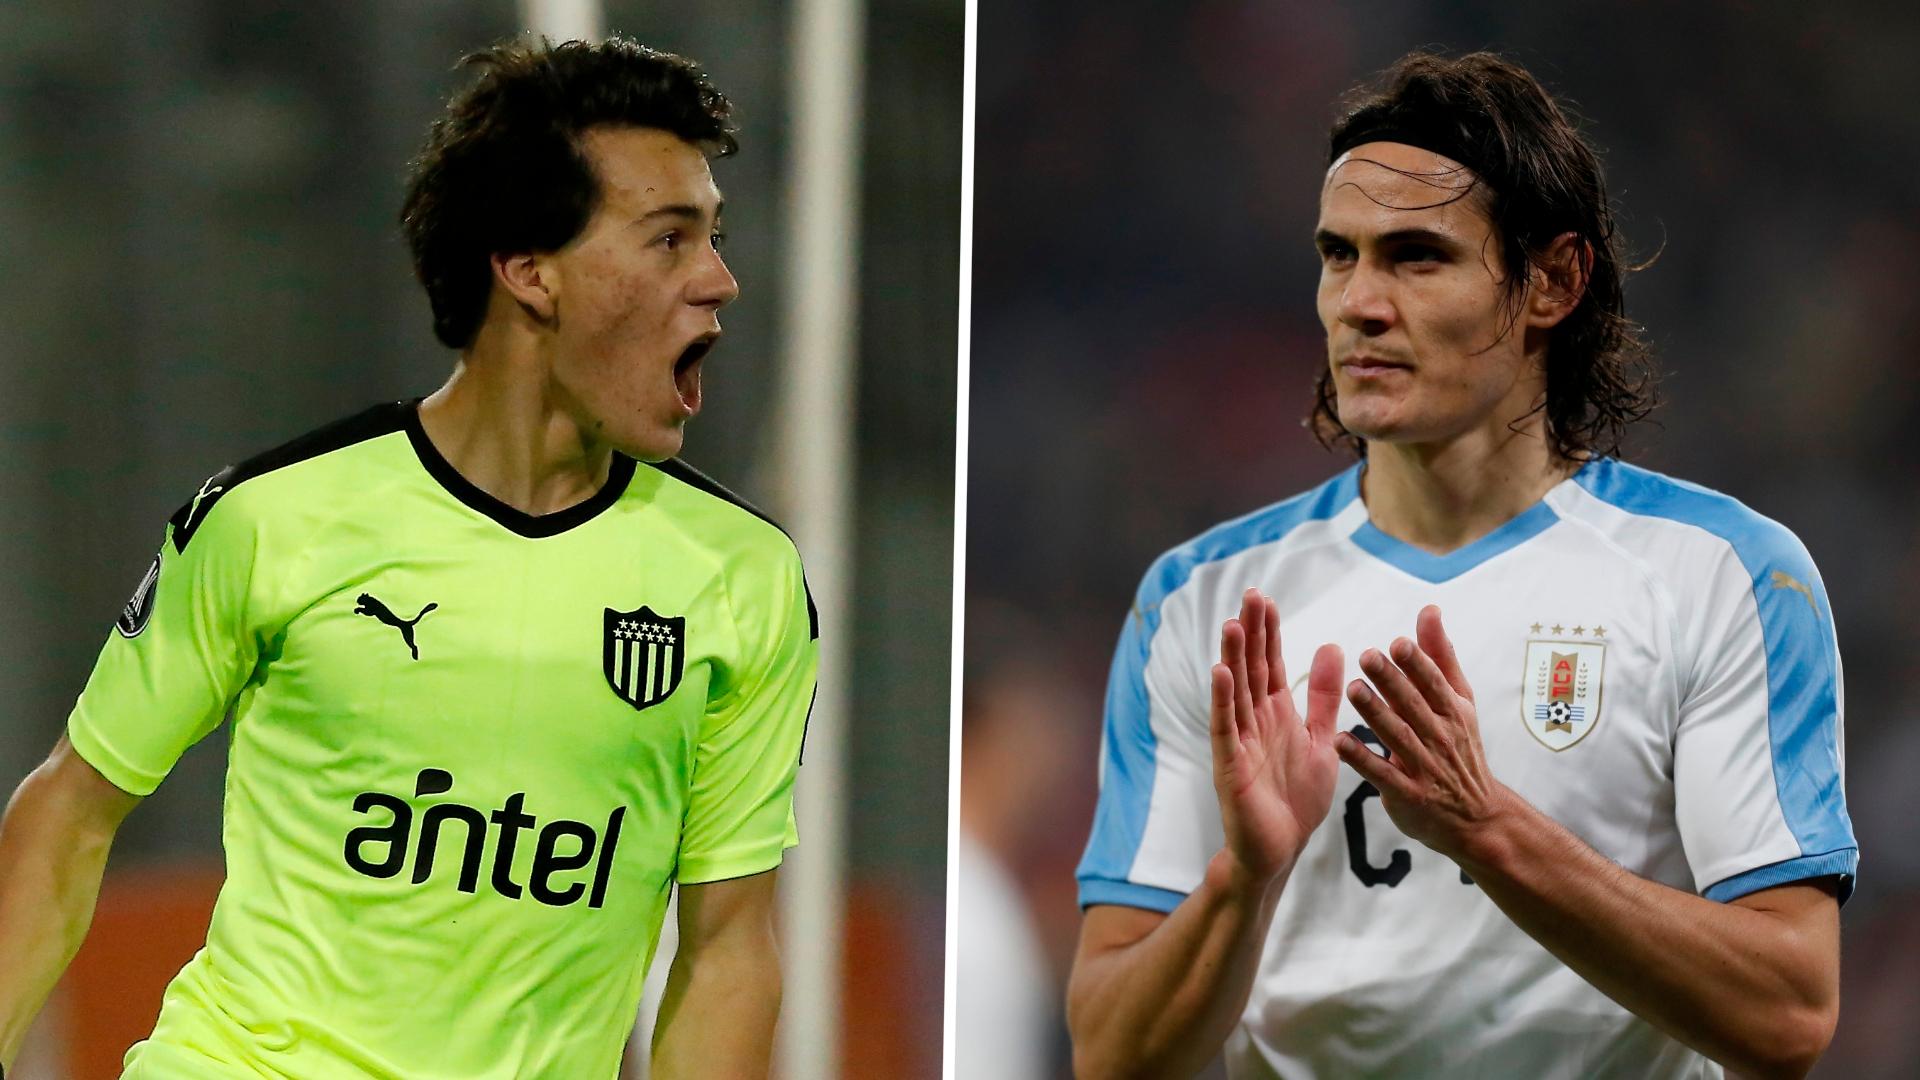 'All the time I speak with Cavani' - Man Utd wonderkid Pellistri says fellow Uruguayan has helped him settle